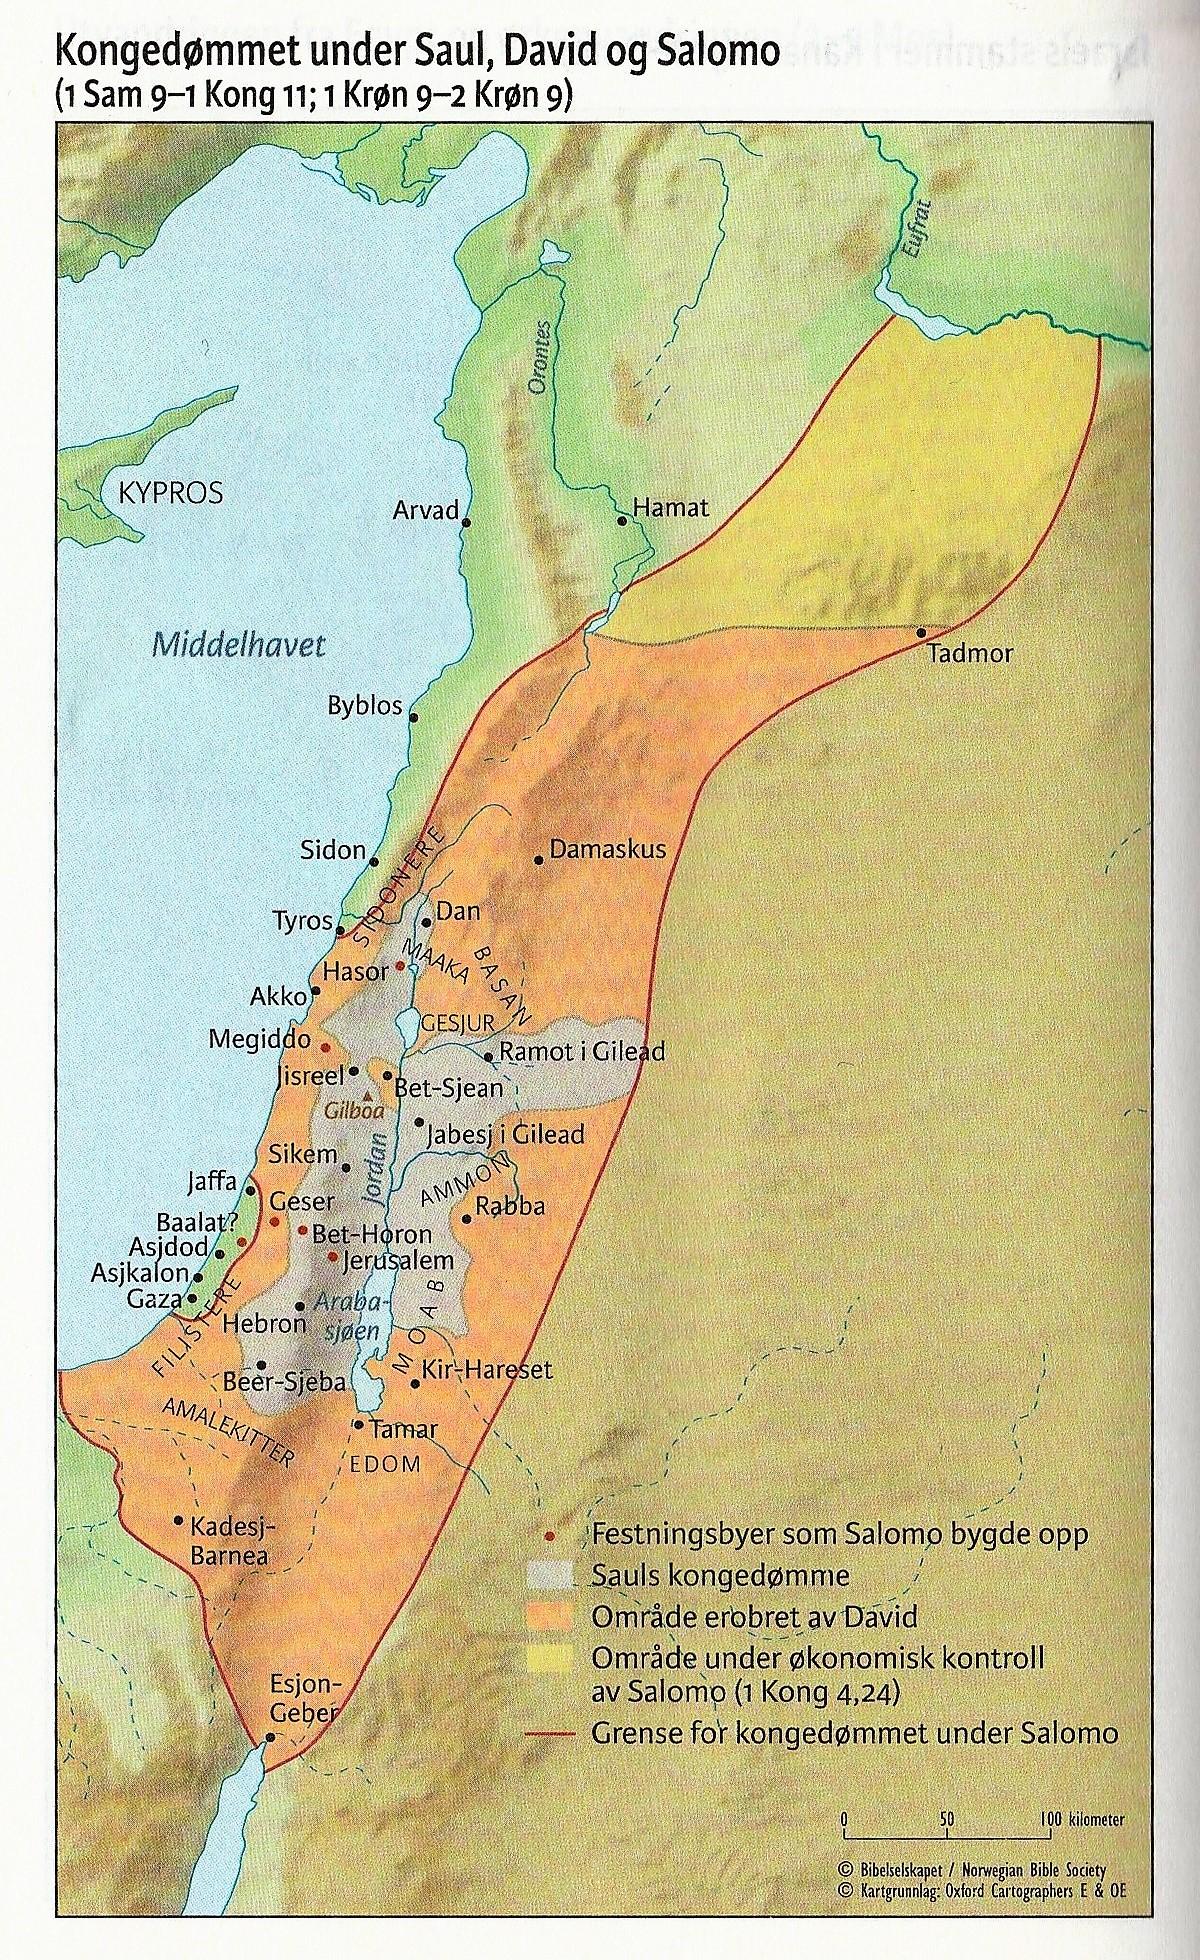 Kongedømmet under Saul, David og Salomo